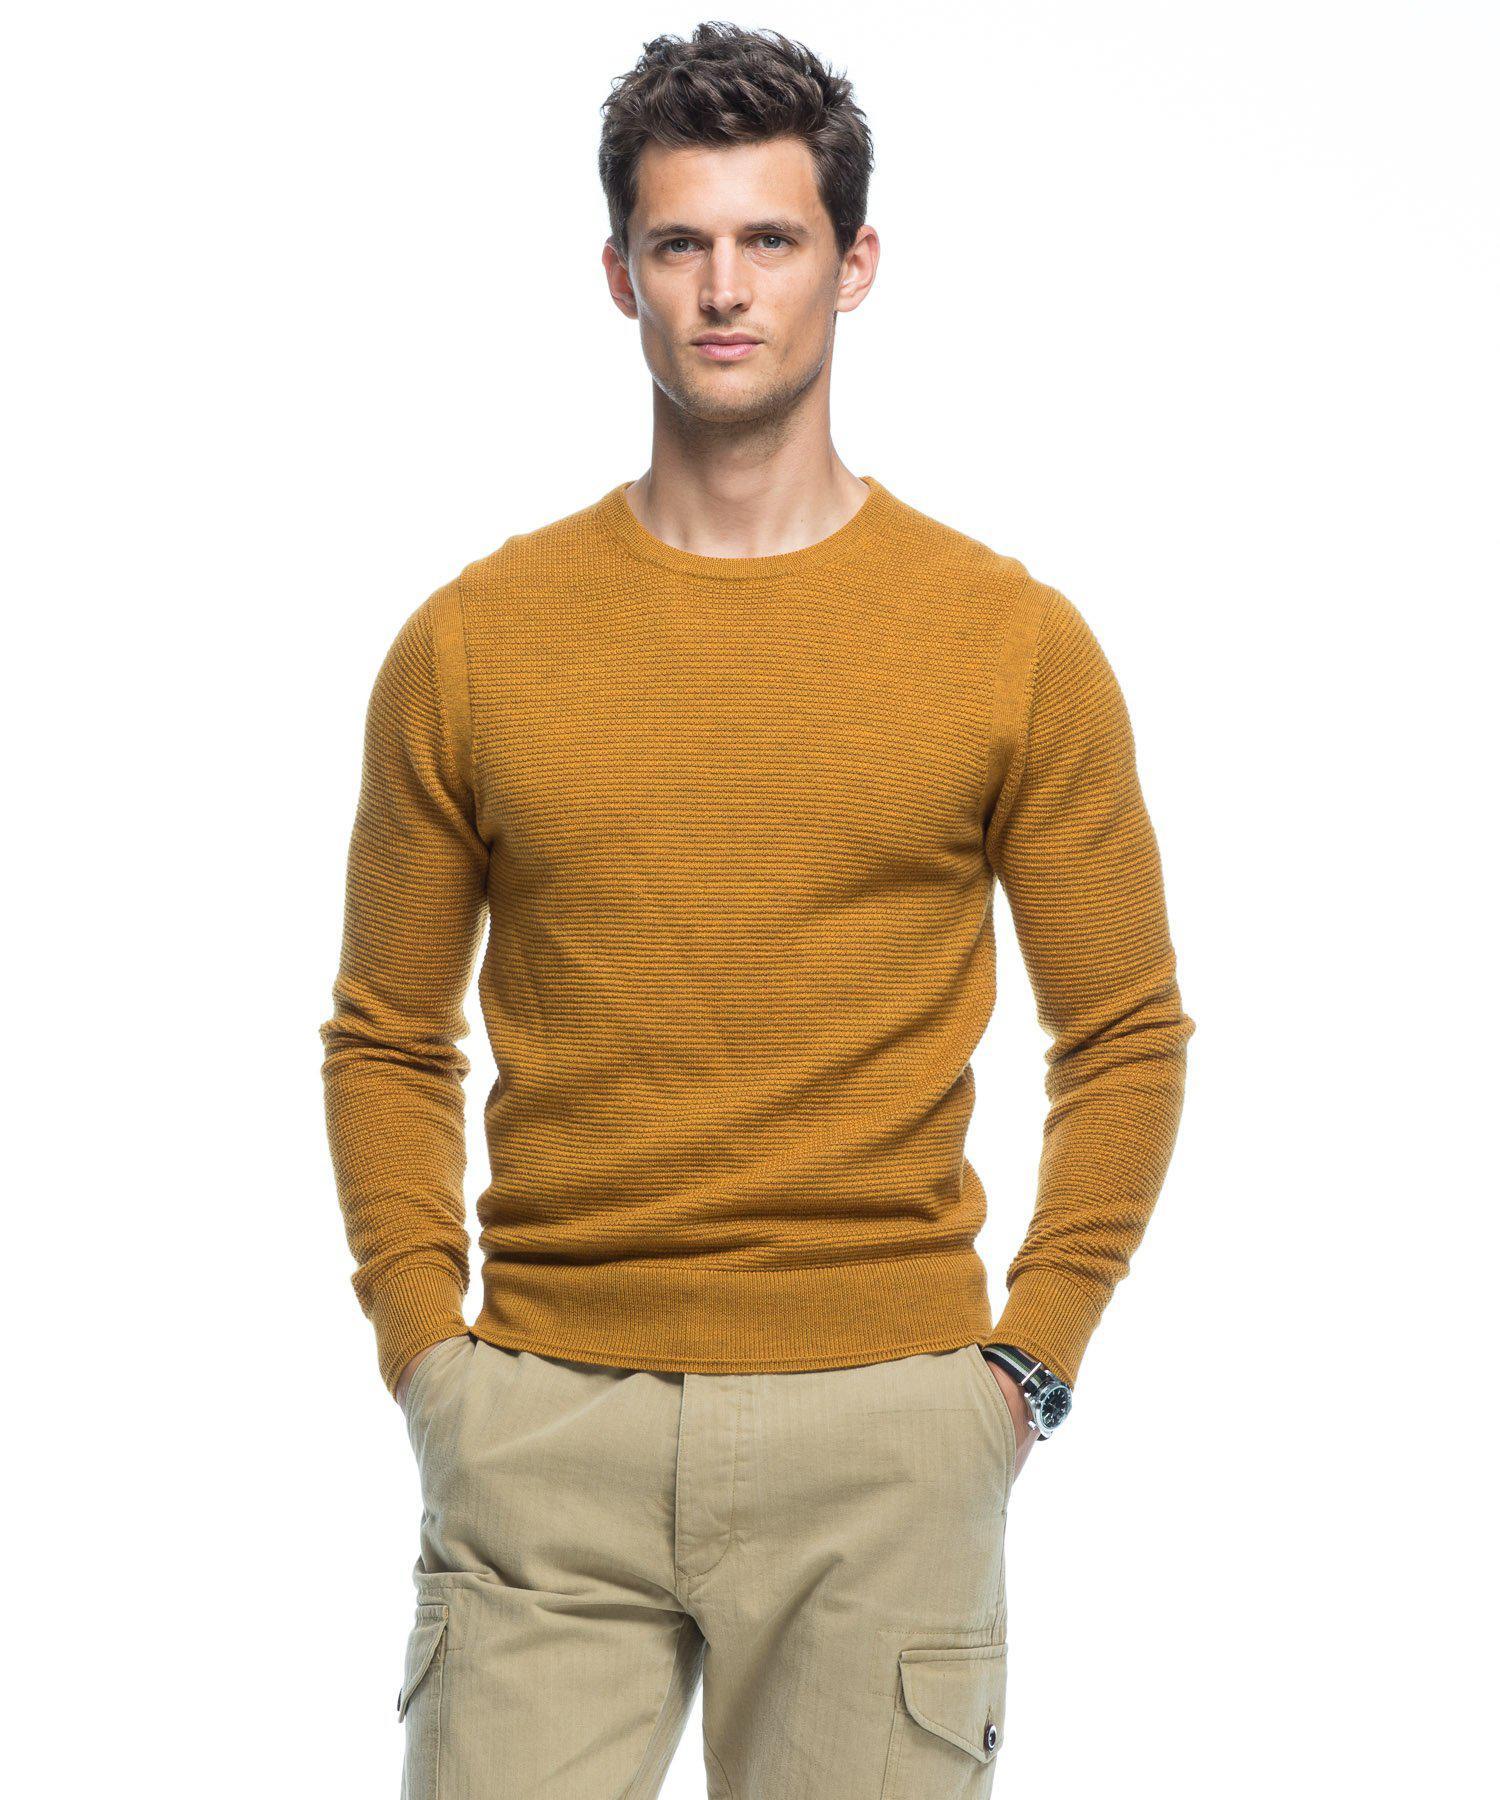 Todd snyder Italian Merino Thermal Crewneck Sweater In Mustard ...